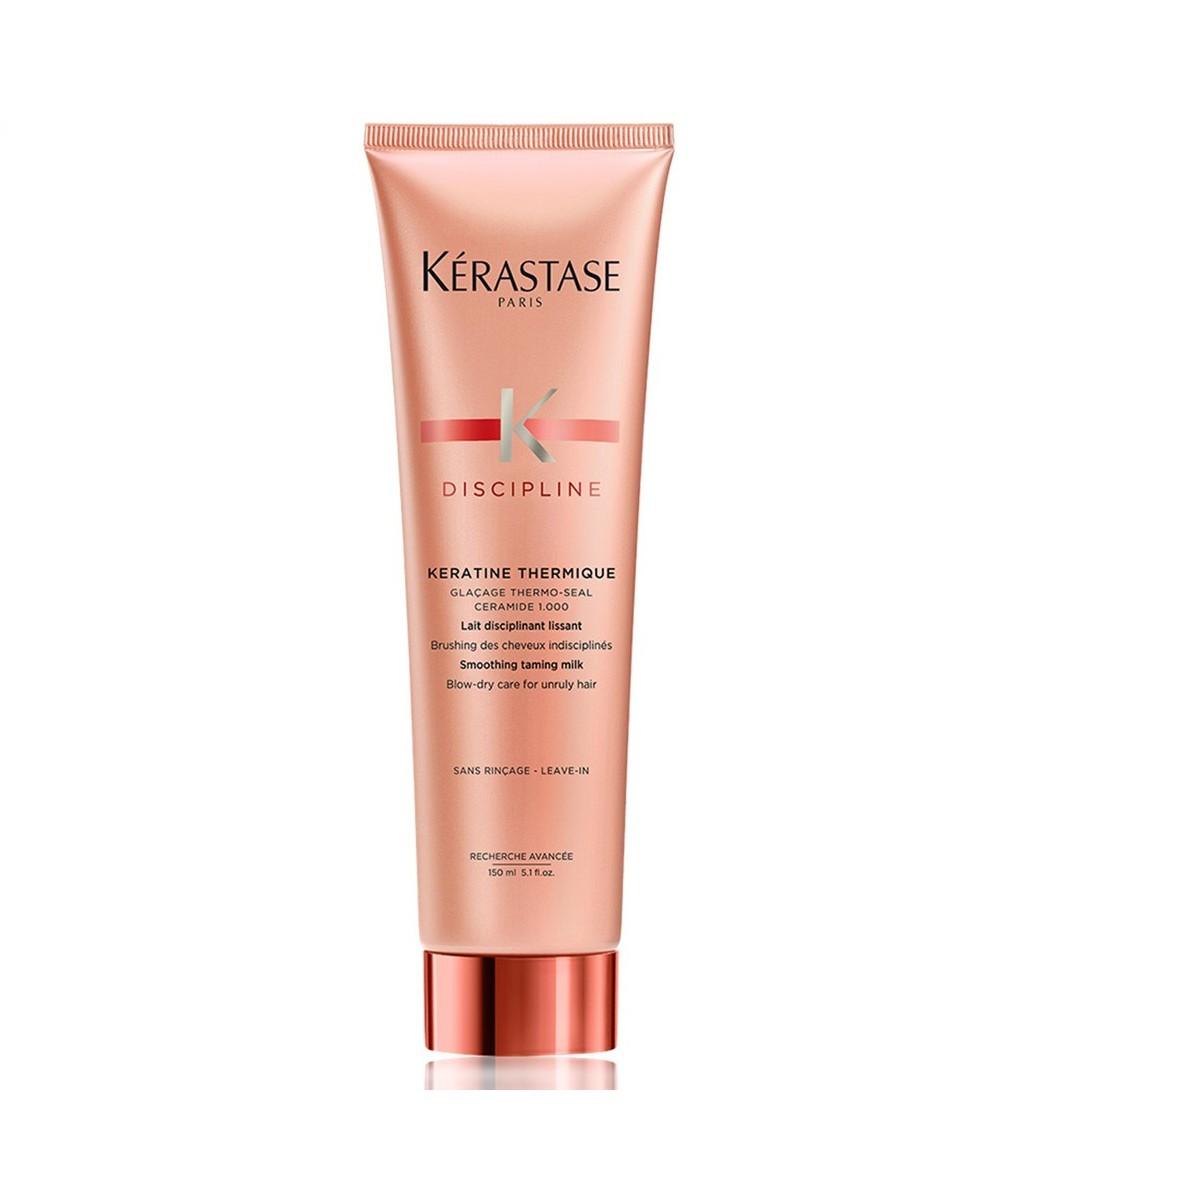 Kérastase Discipline Keratine Thermique - Leave-in 150ml - CA